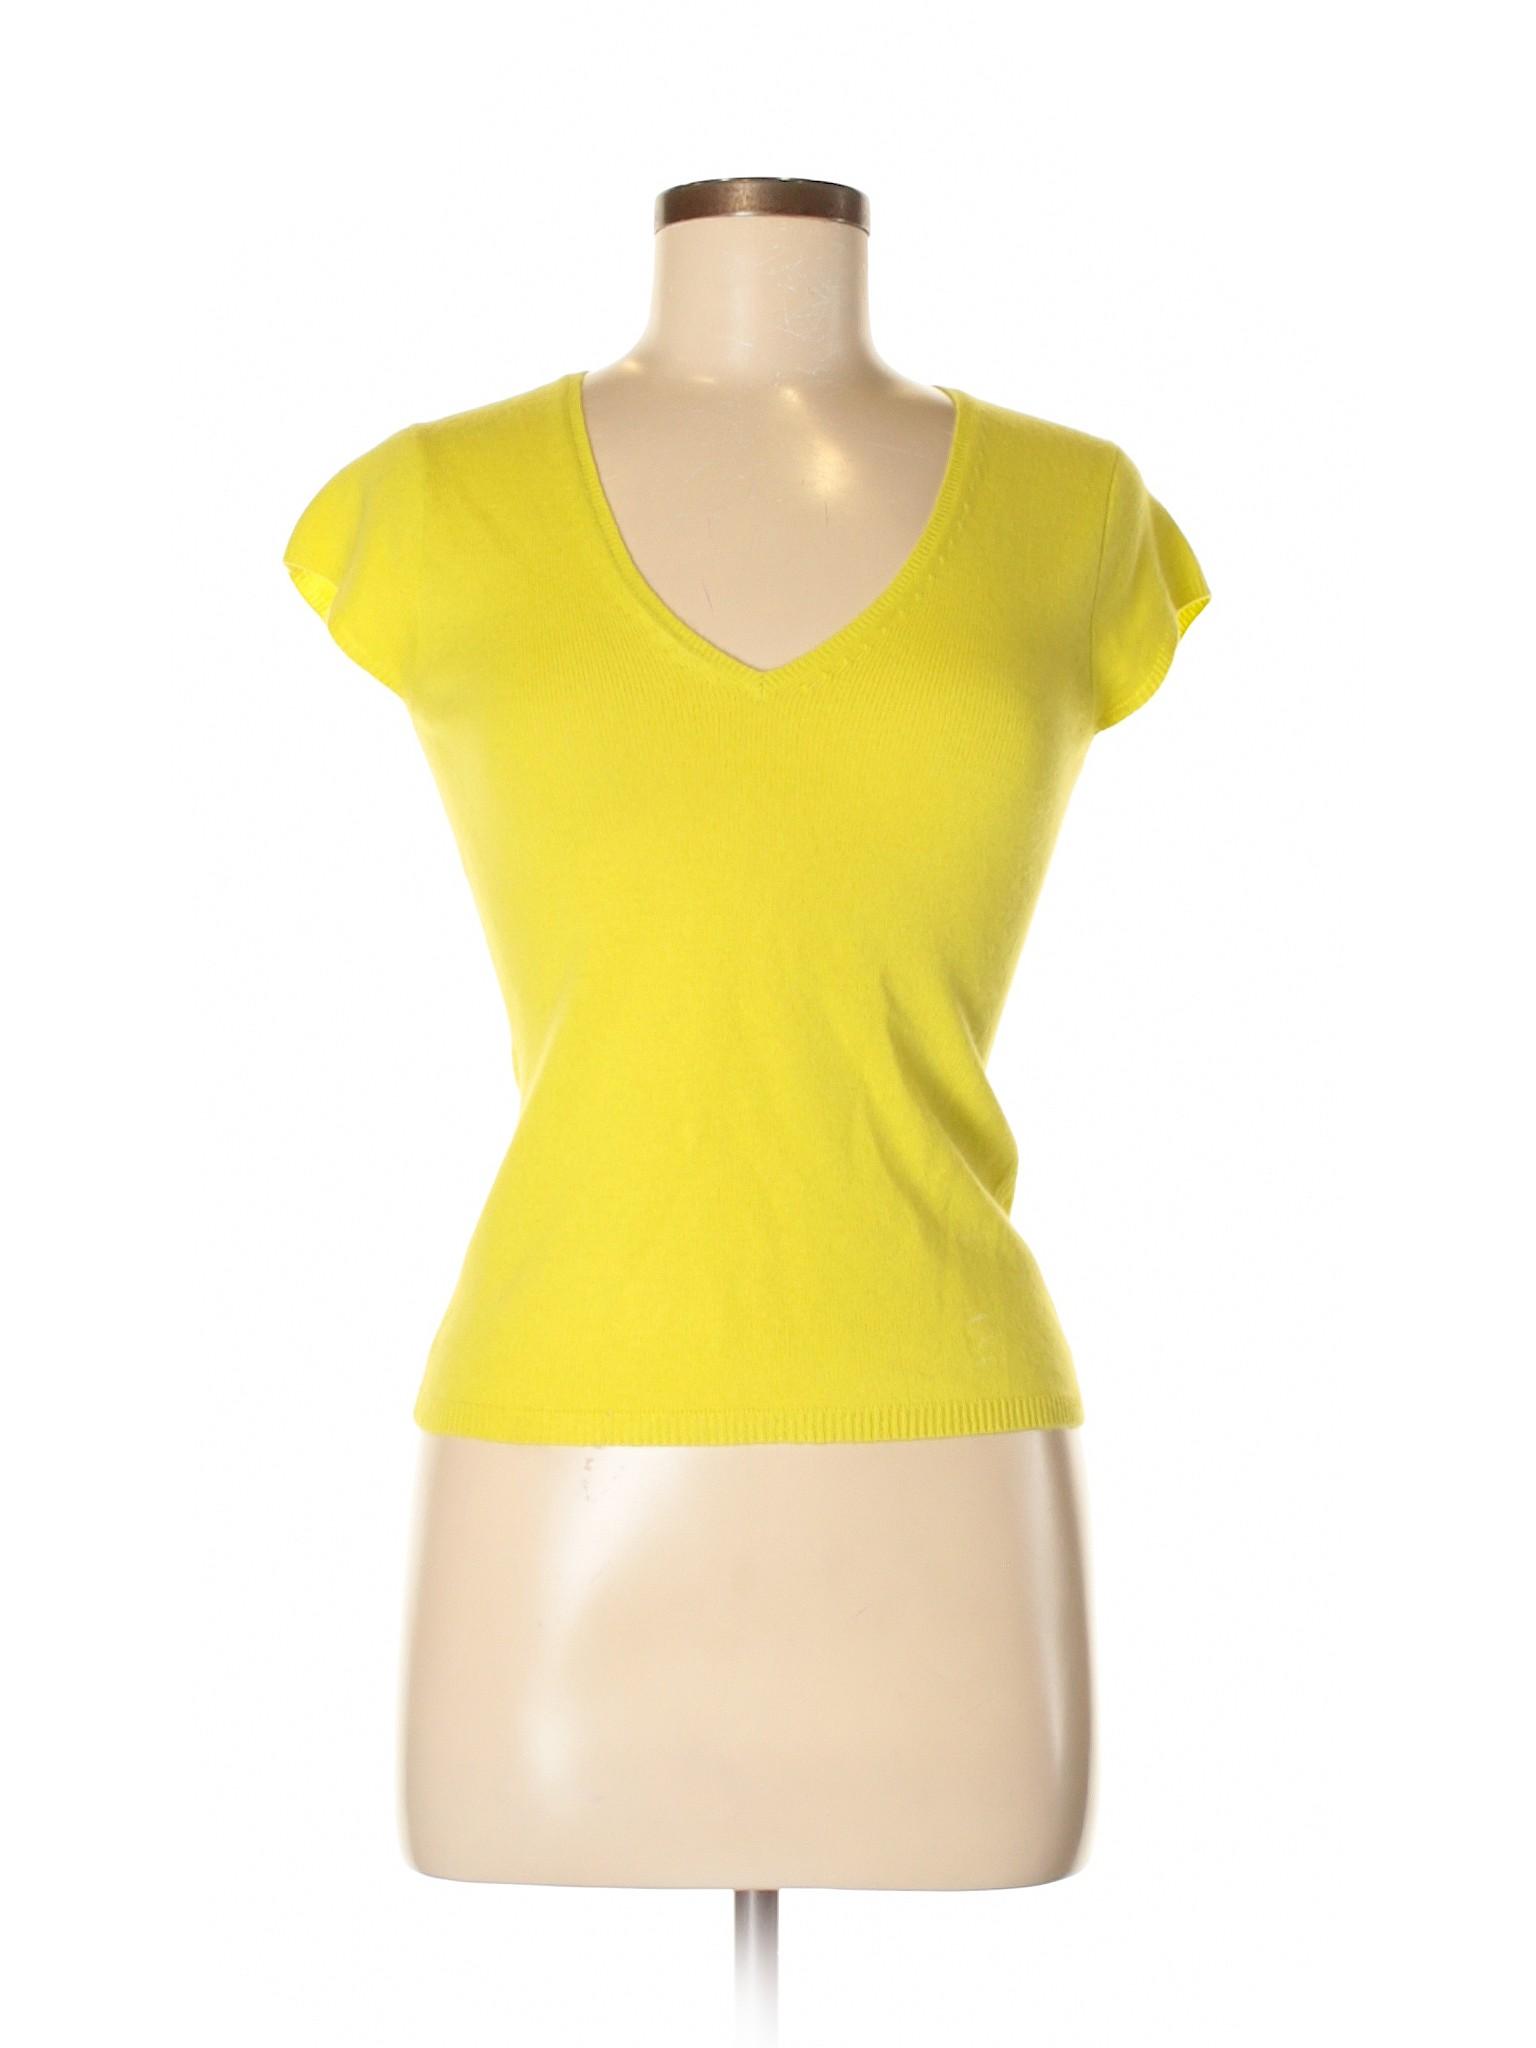 Design Vest Studio Boutique Sweater Express 5IBxqcP0